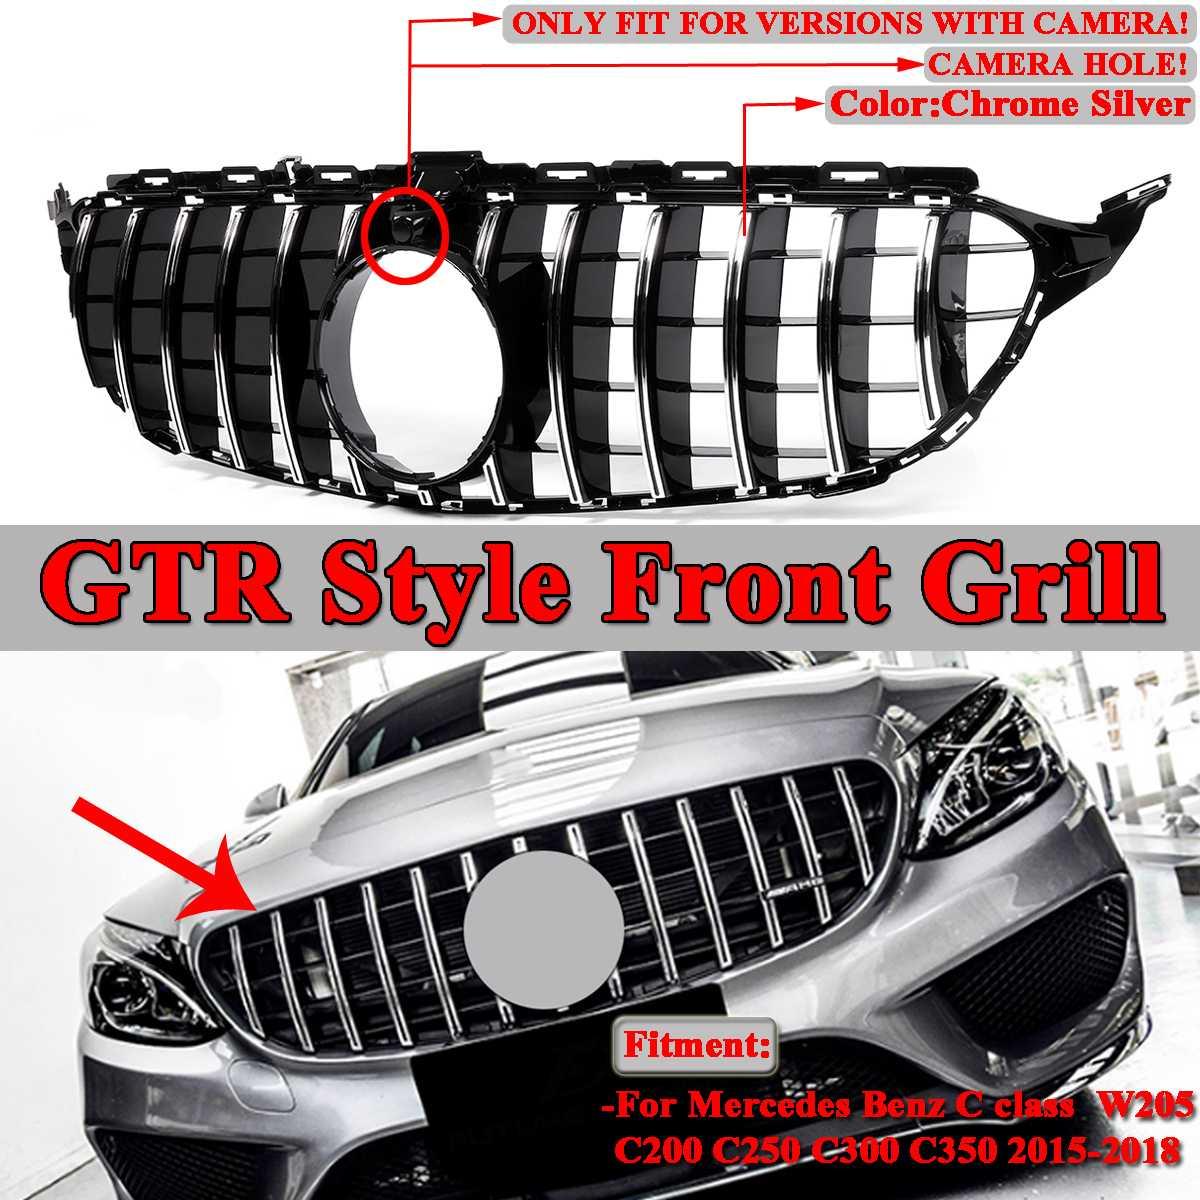 W205 GTR GT R รถด้านหน้าย่าง Grille สีดำ/Chrome Silver สำหรับ Mercedes For Benz W205 C200 C250 c300 C350 2015-2018 2Dr/4Dr